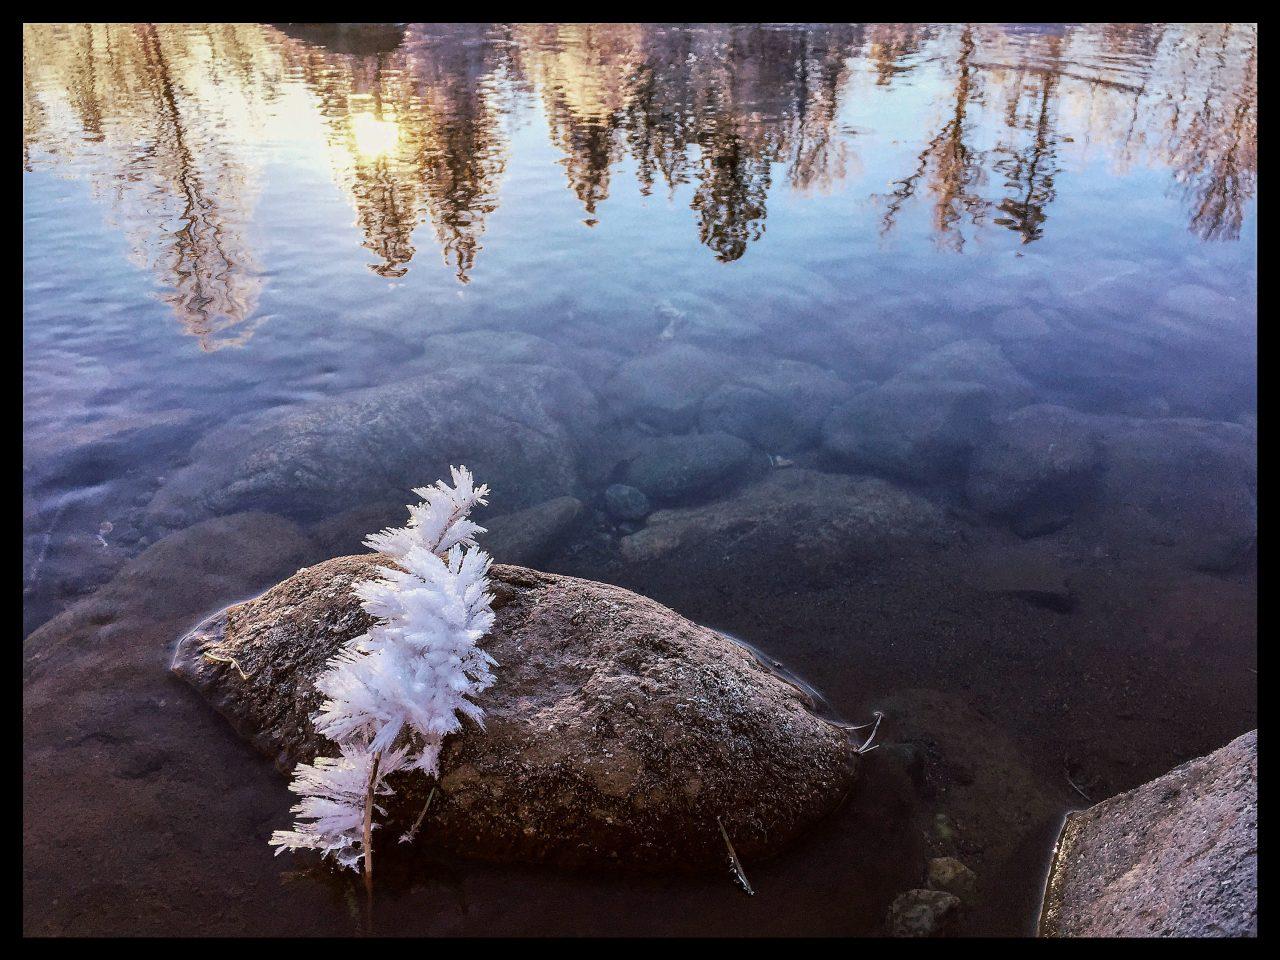 Squamish Bald Eagles : 2016-01-02 : iPhone Landscape